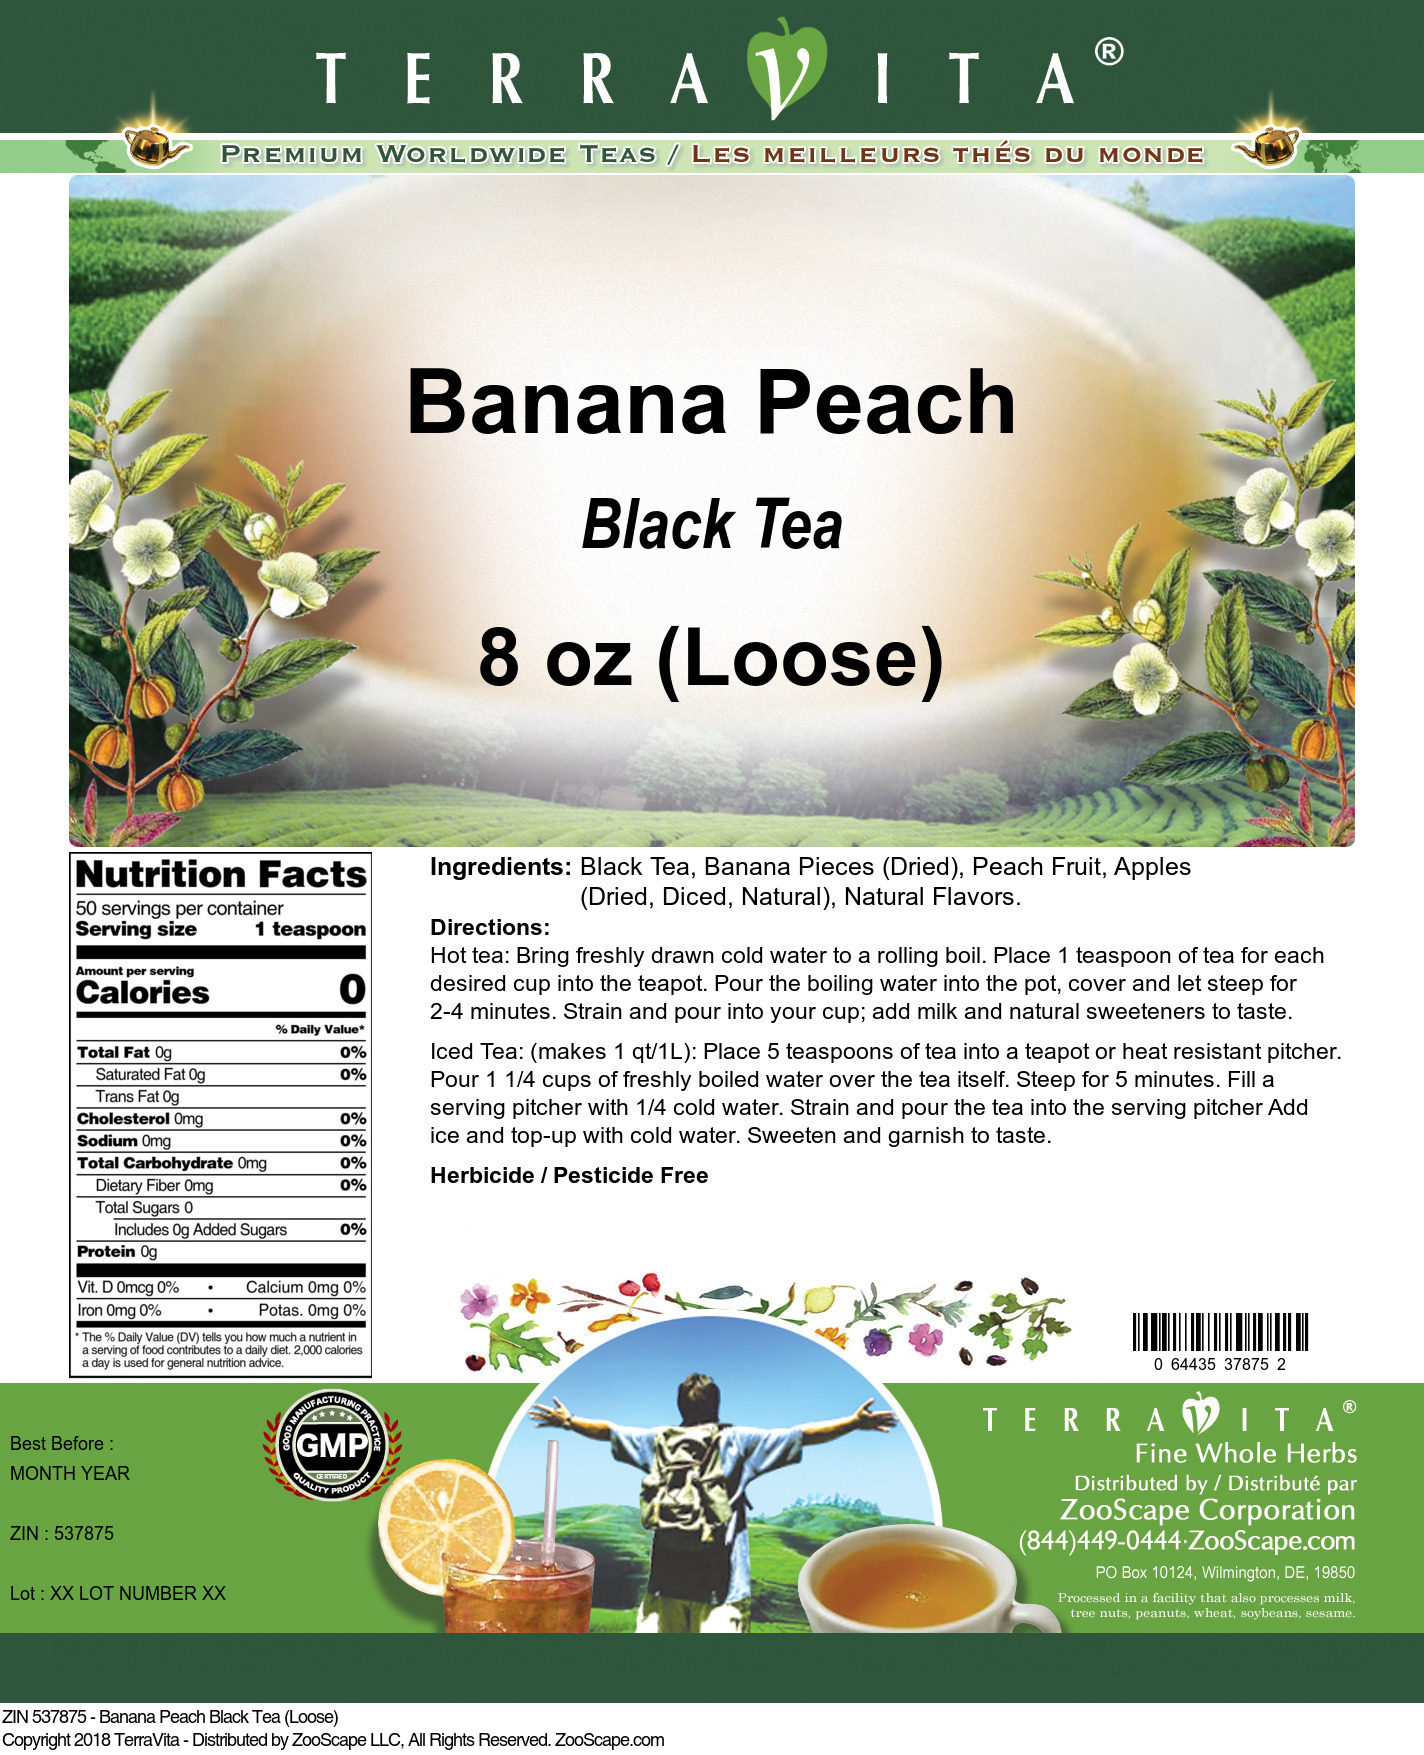 Banana Peach Black Tea